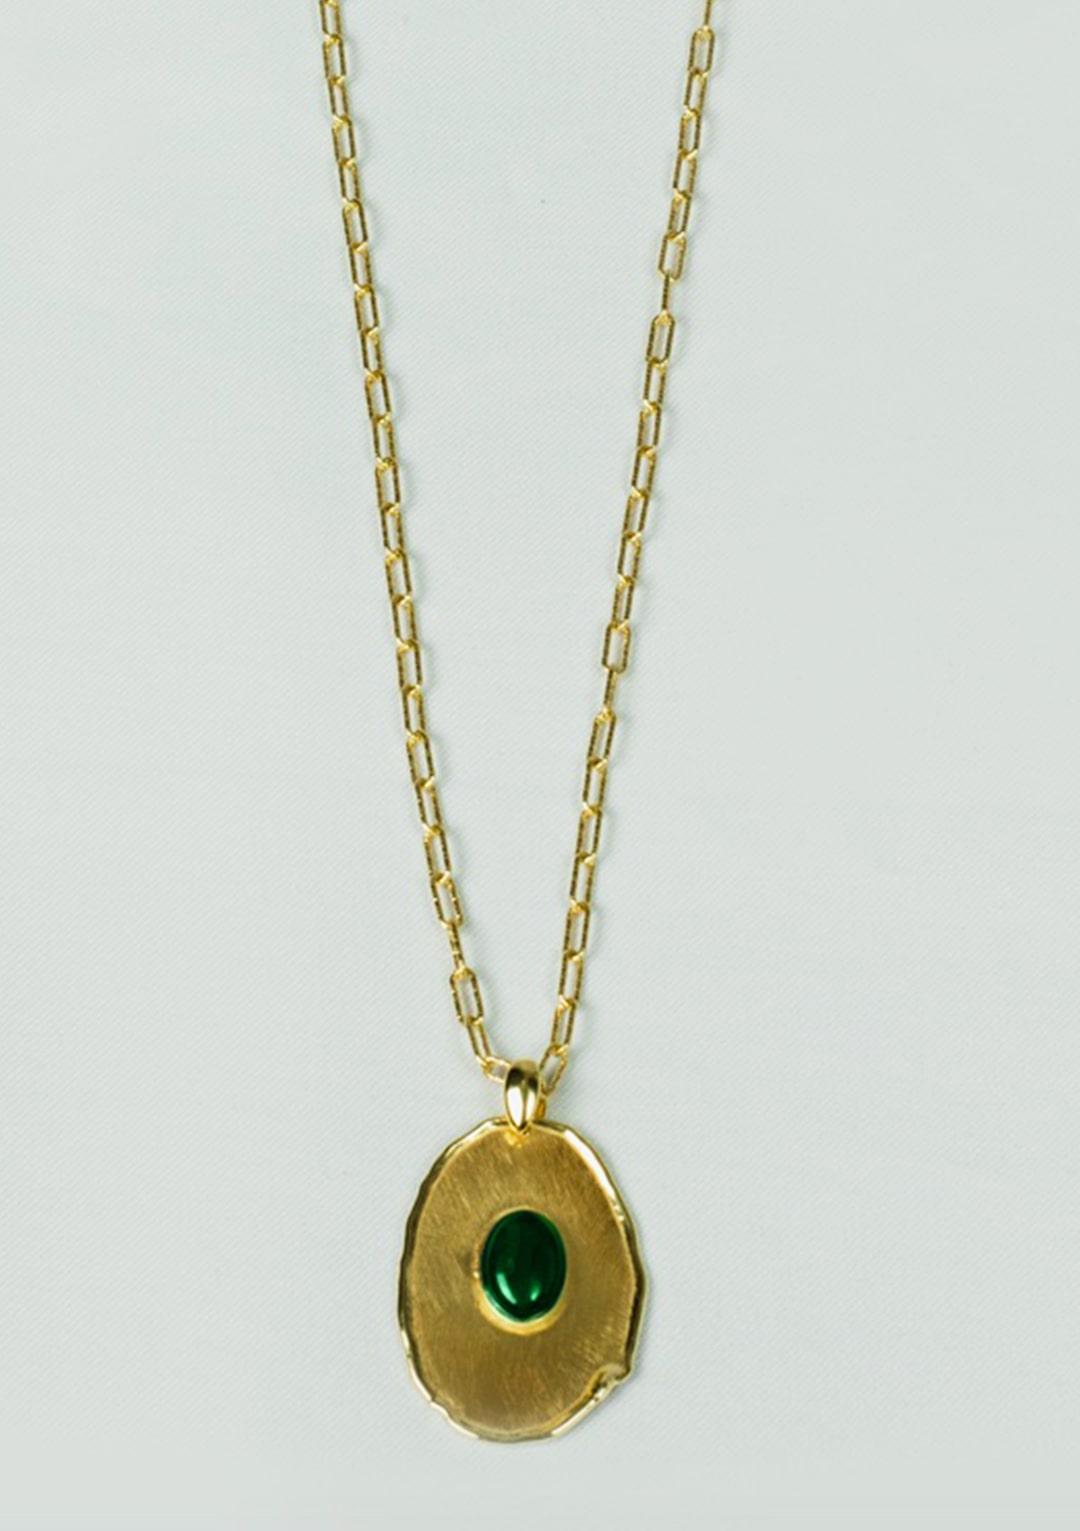 Sautoir I jade vert argent doré or fin I Elliade I vue de face I Label AÉ Paris